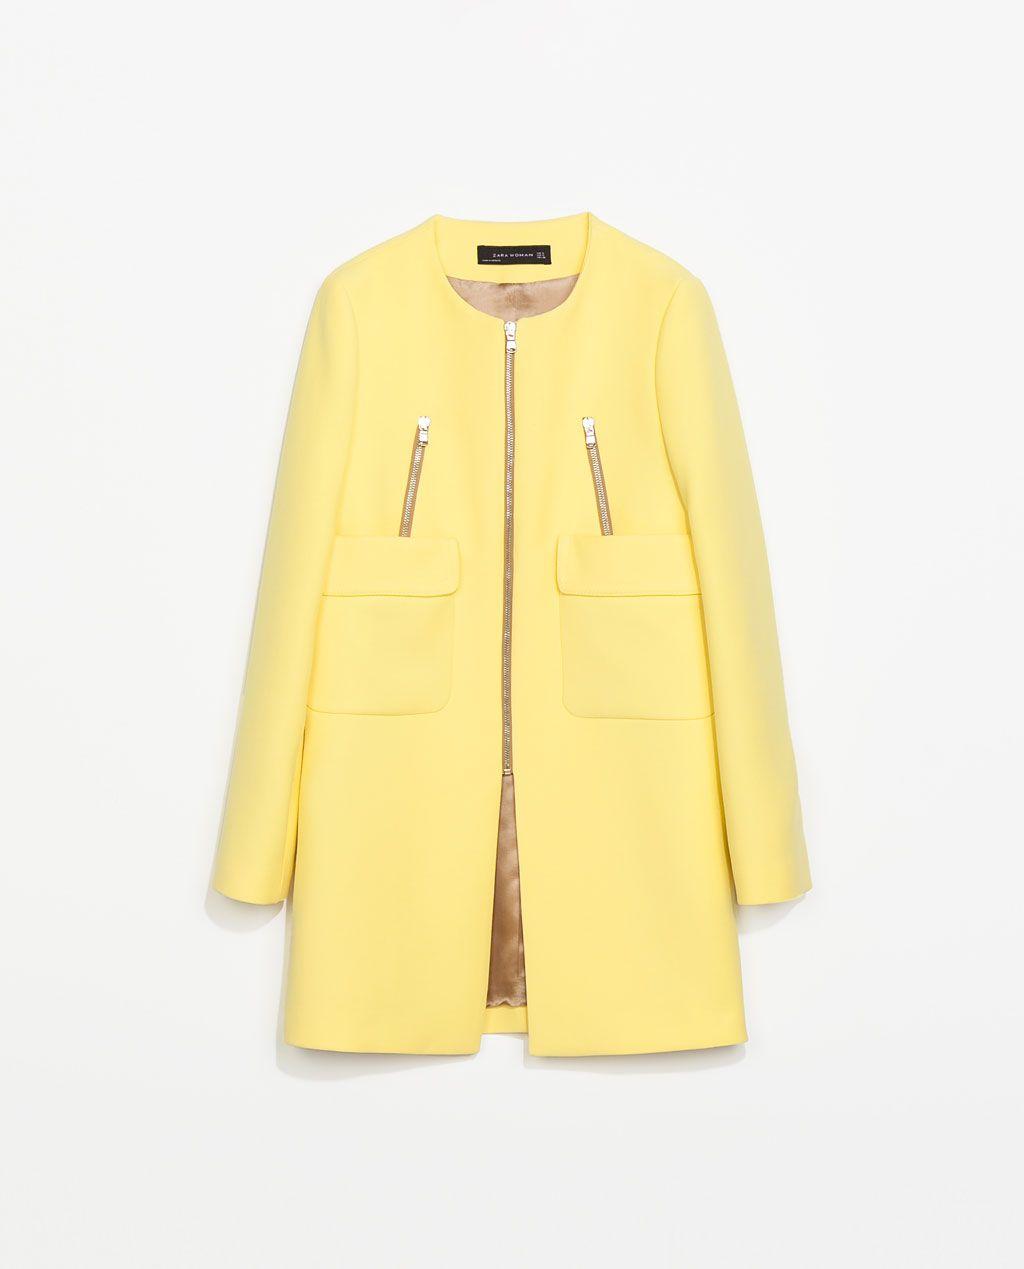 PocketsModa Coat Joven Pinterest Zara Woman With SGMzUVqp